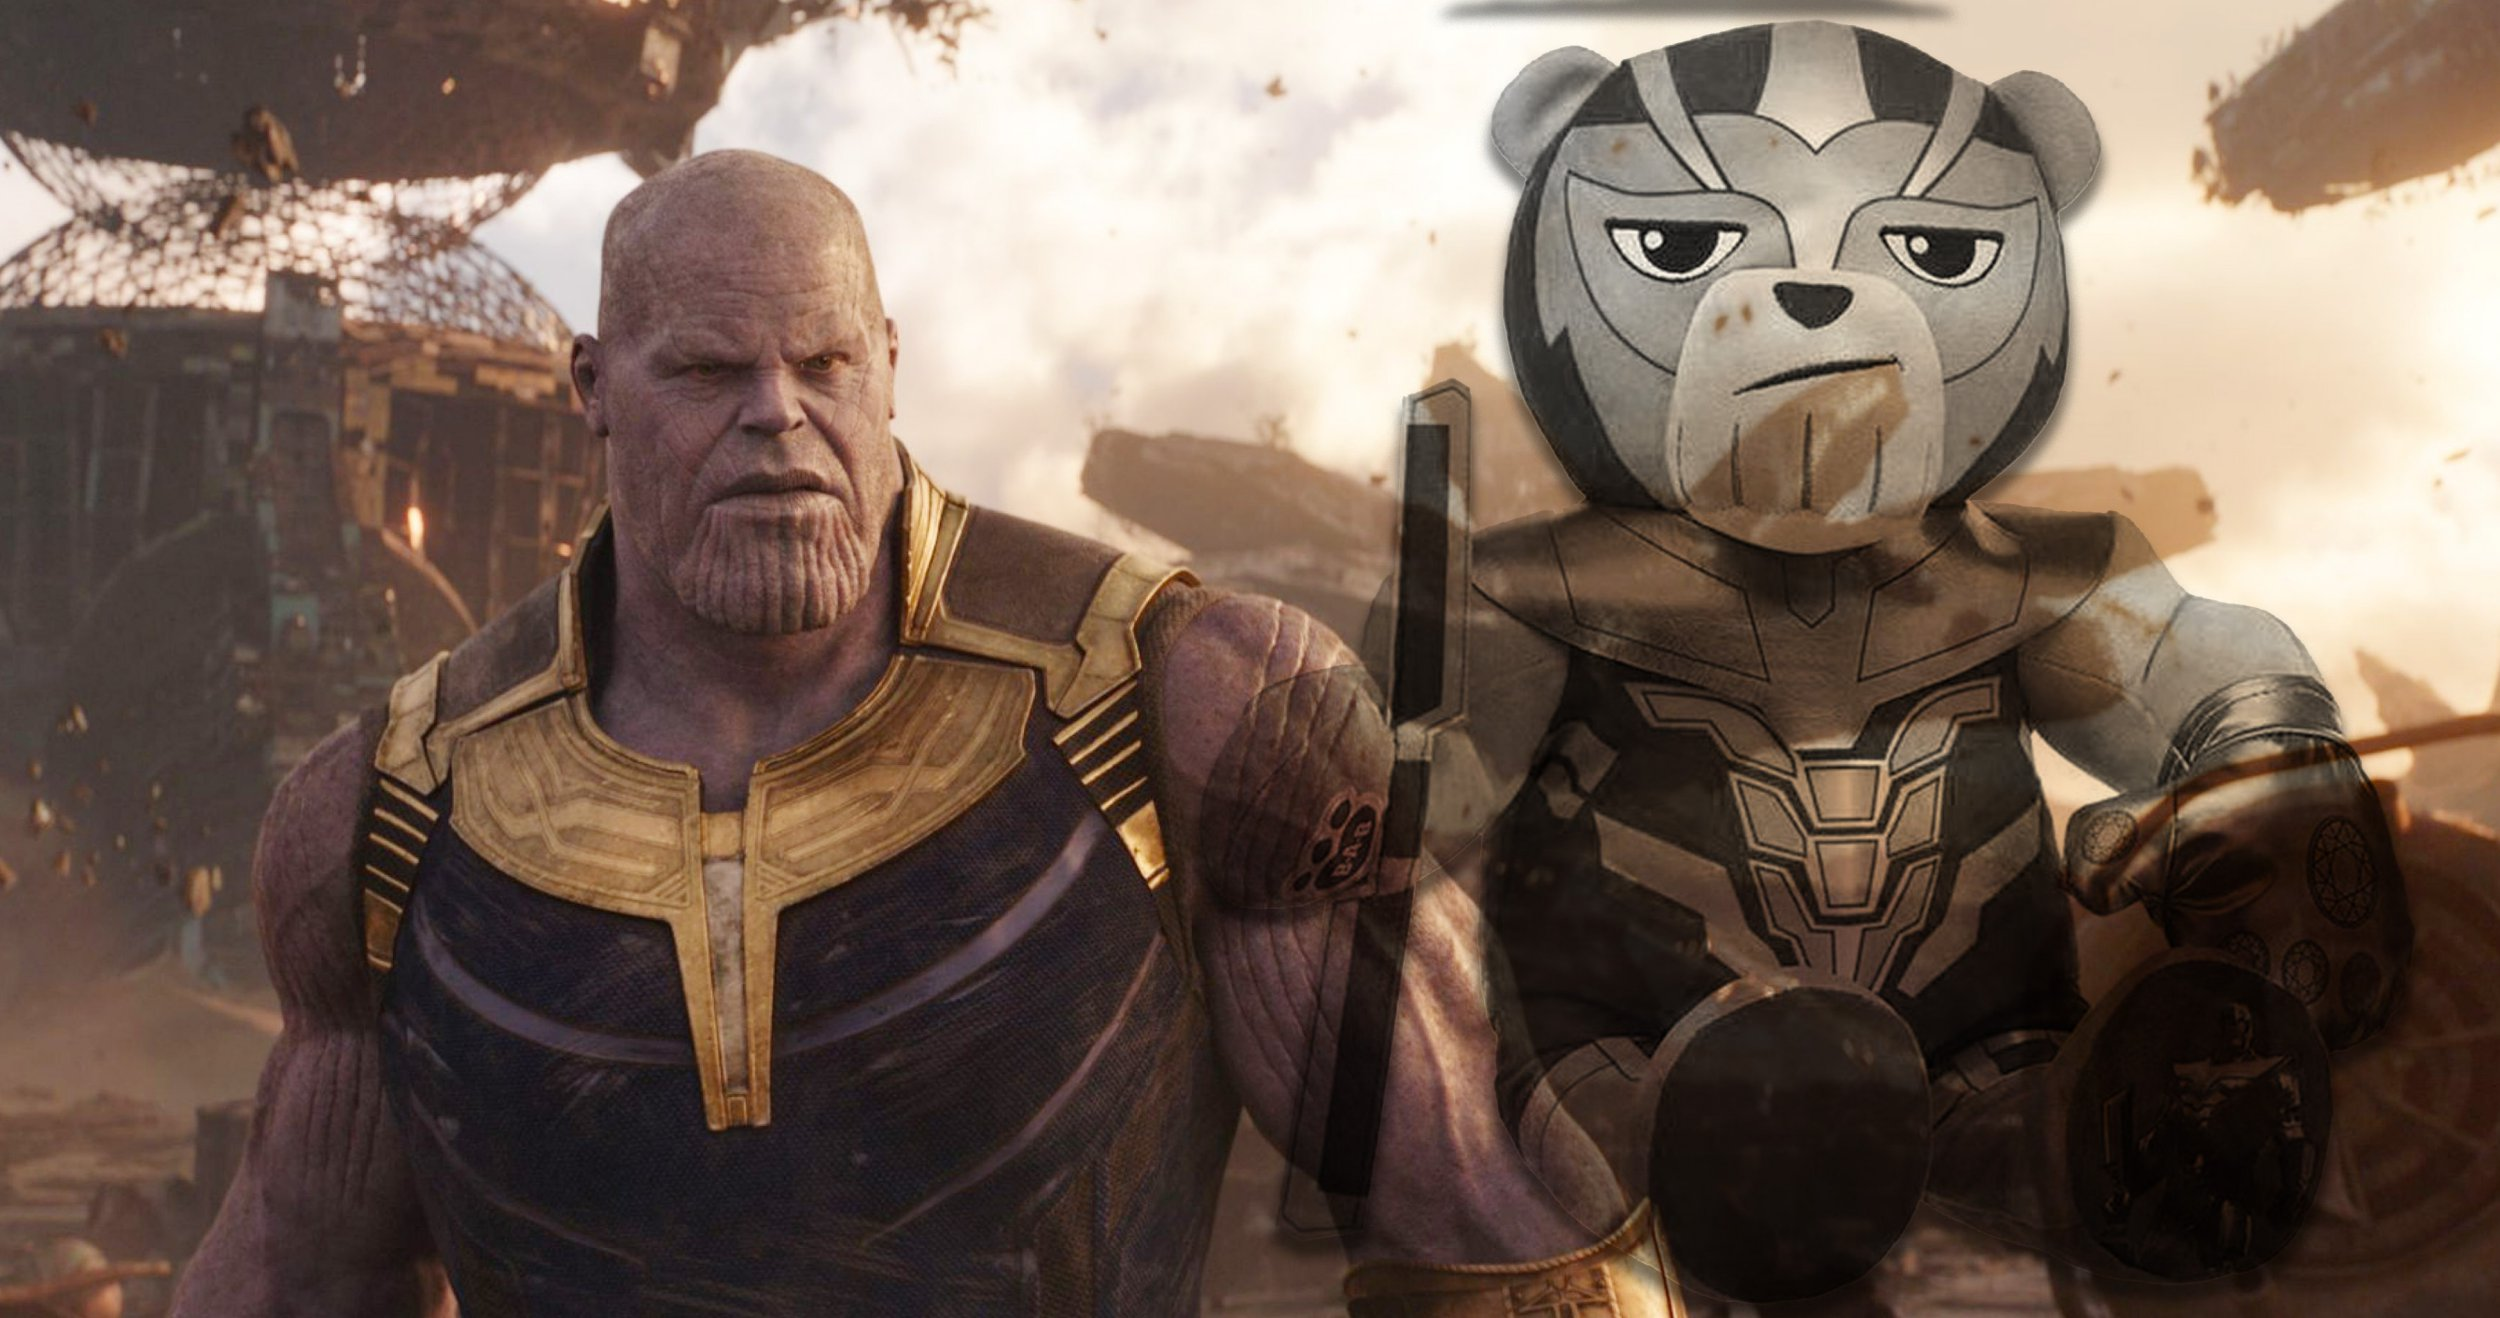 Has this Thanos teddy bear spoiled Avengers: Endgame?